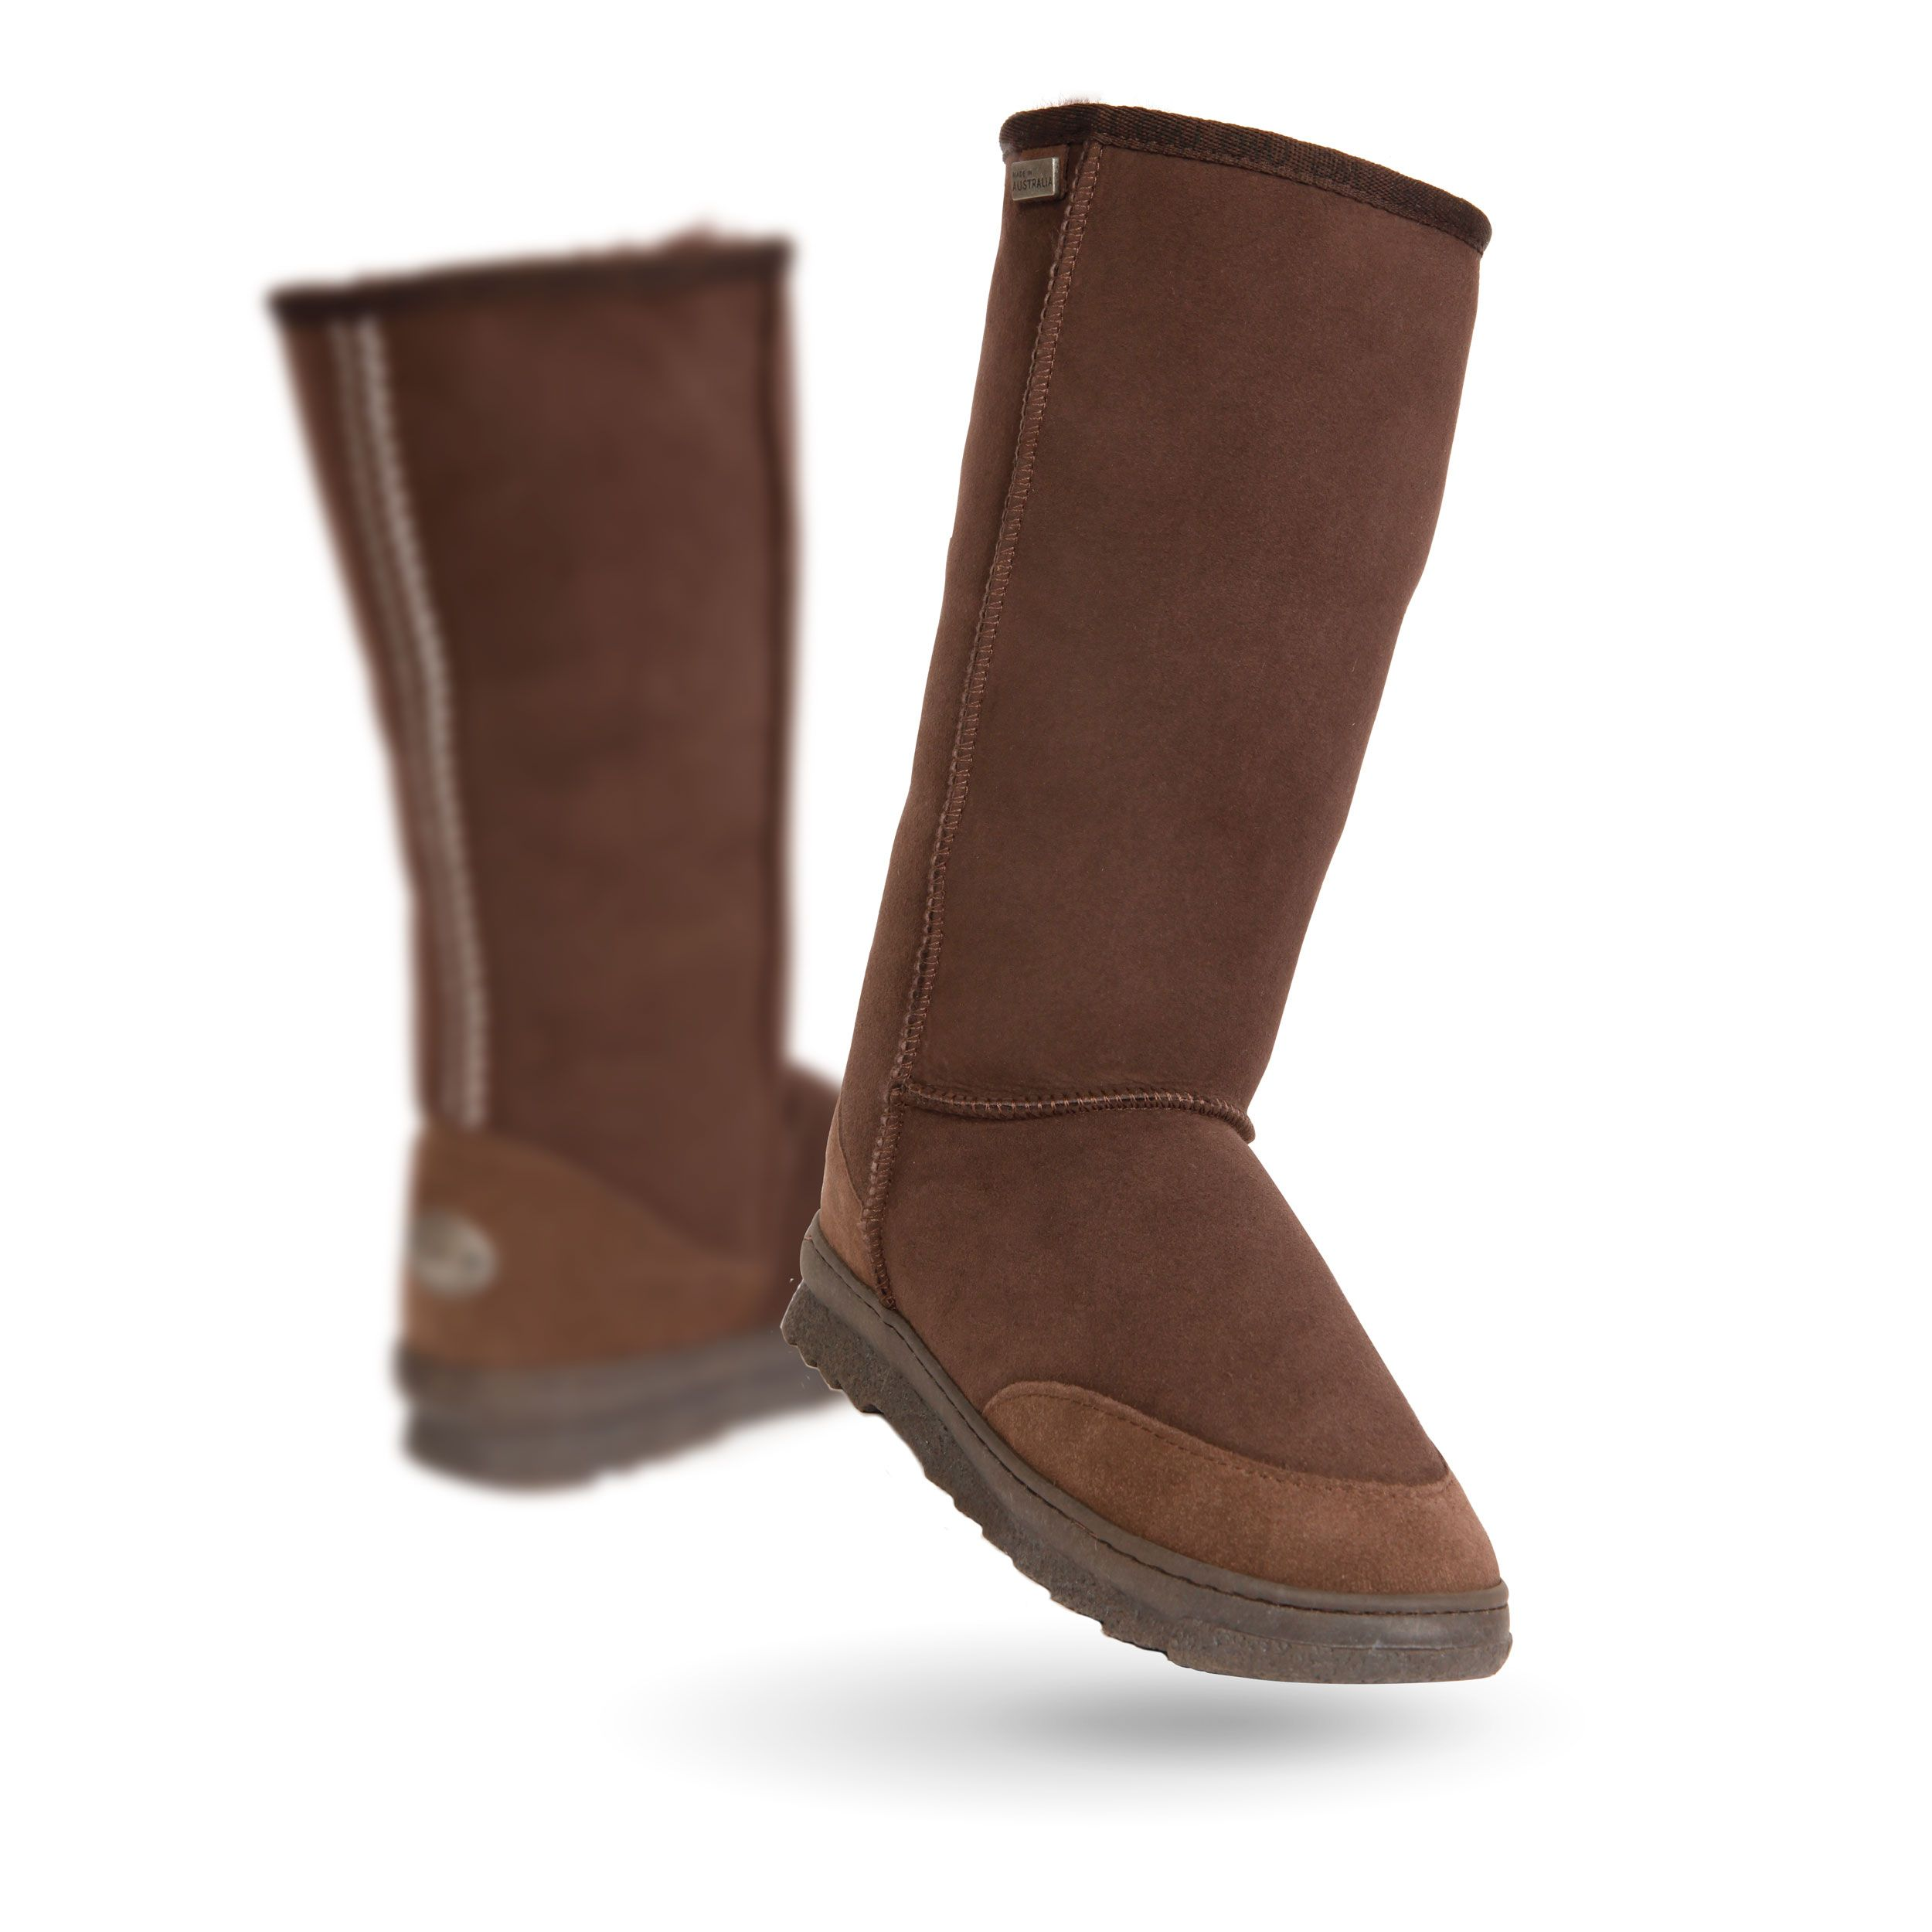 870b0737eca Platinum Outback Hi | Fashion | Sheepskin boots, Boots, Ugg boots